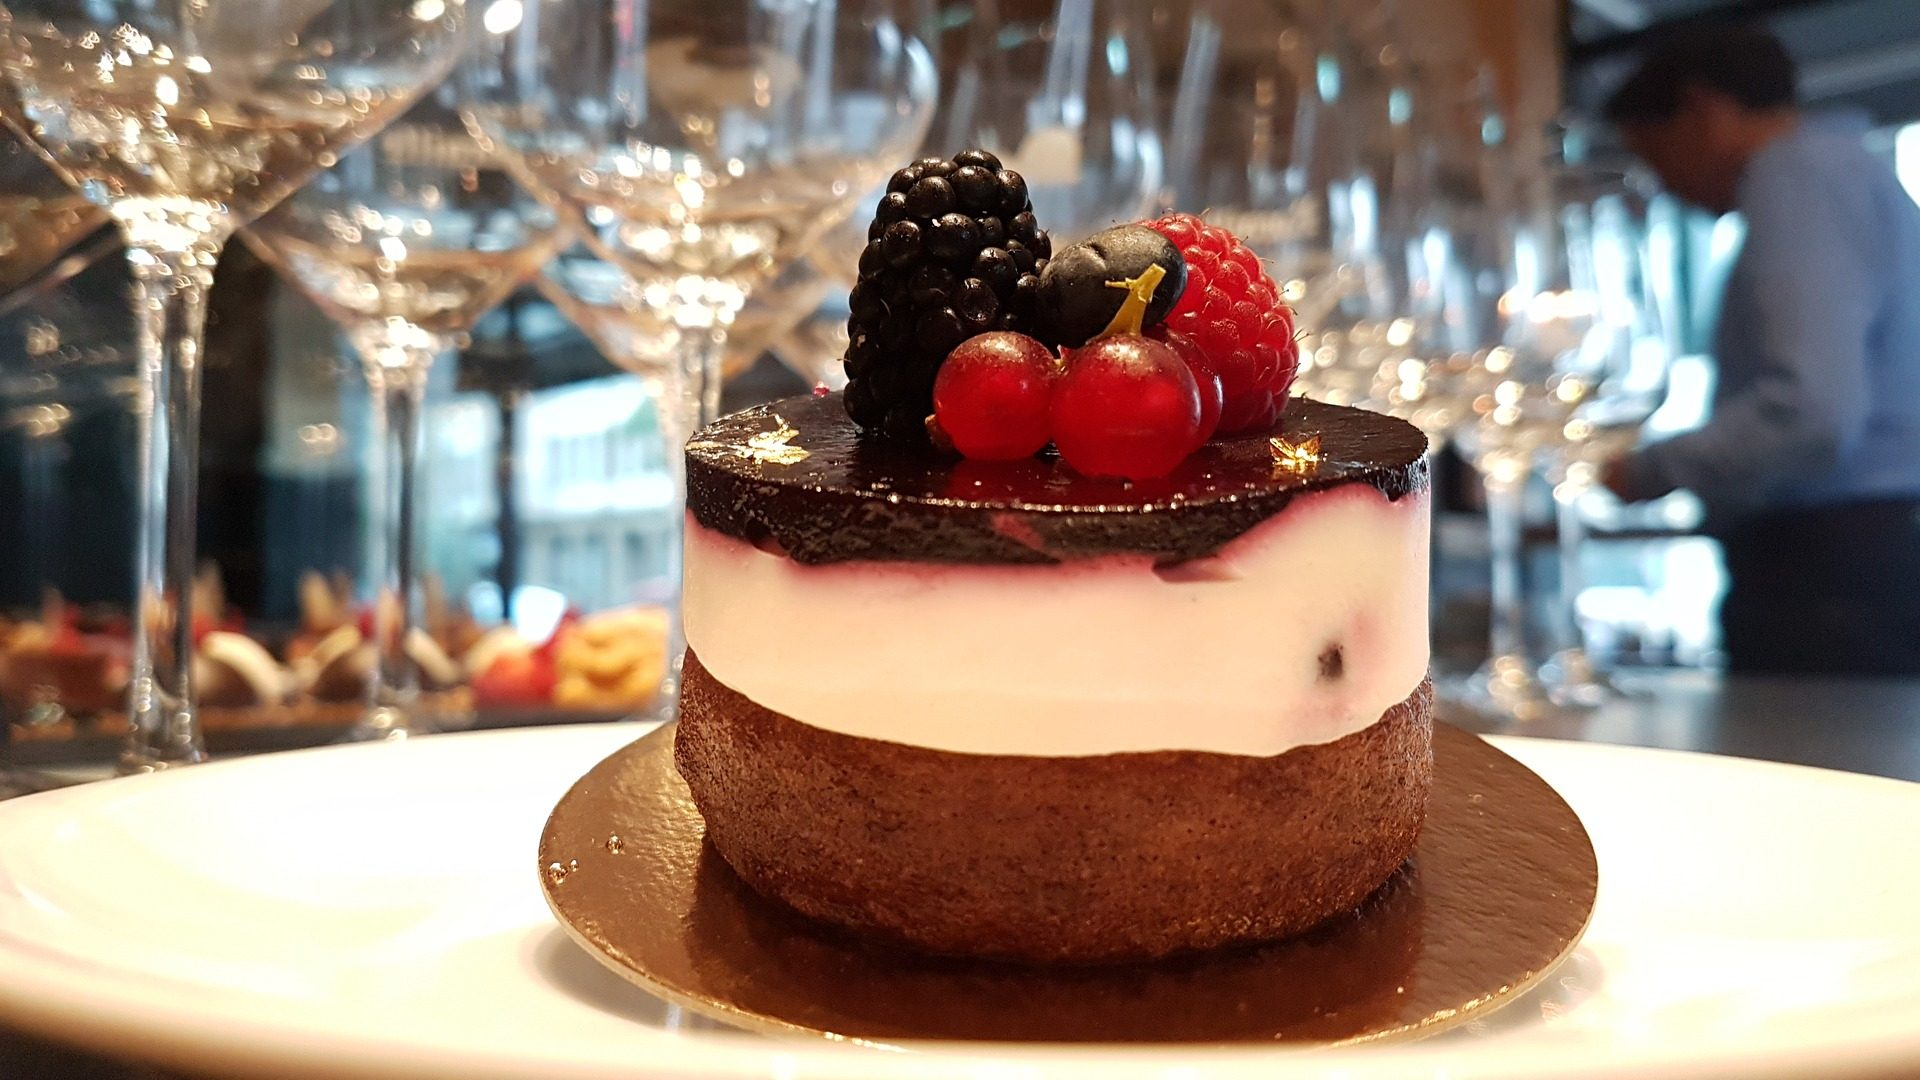 tarta, bolo, doce, pastelaria, sobremesa, Amoras silvestres, bagas - Papéis de parede HD - Professor-falken.com